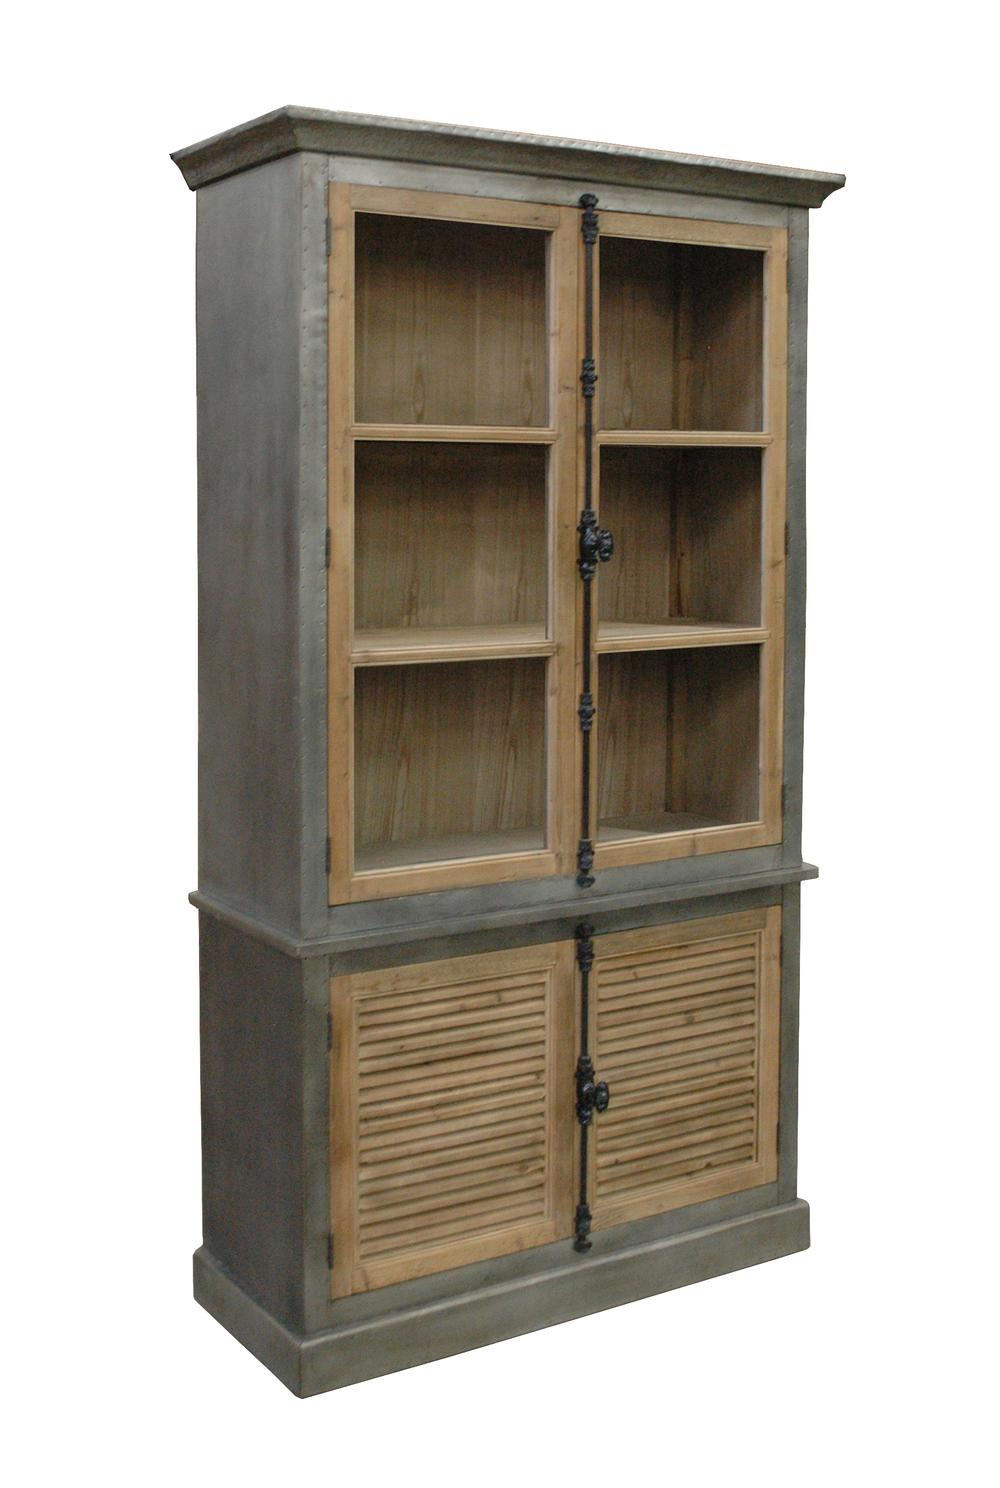 GJ Styles - Zinc Wrapped Bookcase